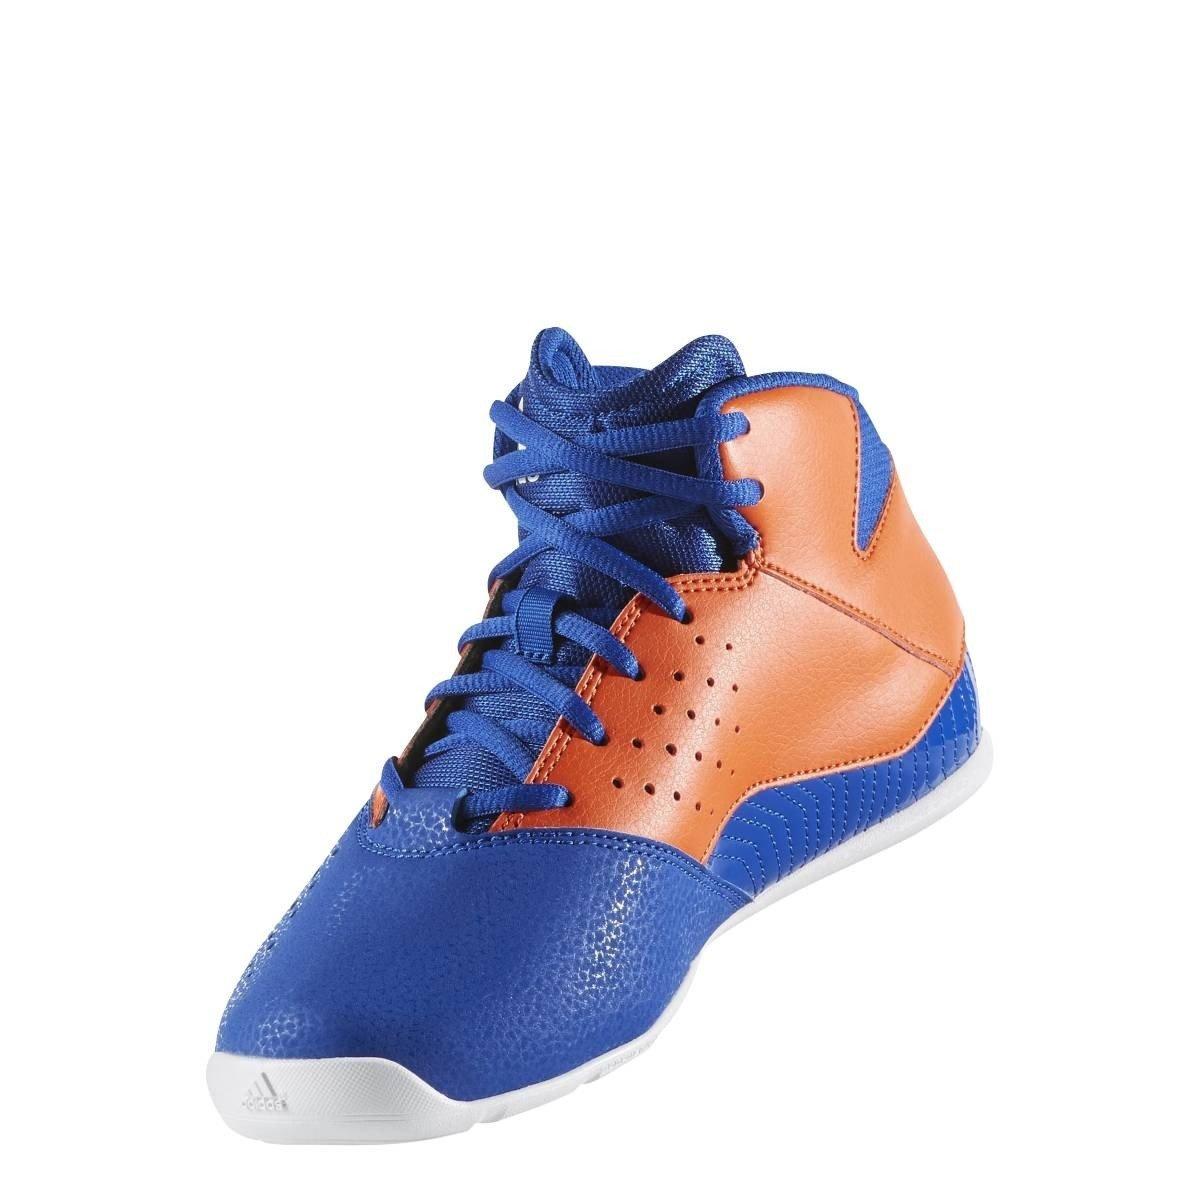 Adidas Nxt LVL SPD V NBA K, Zapatos de Baloncesto Unisex Niños (Azul/naranj/ftwbla) 28 EU BW0501